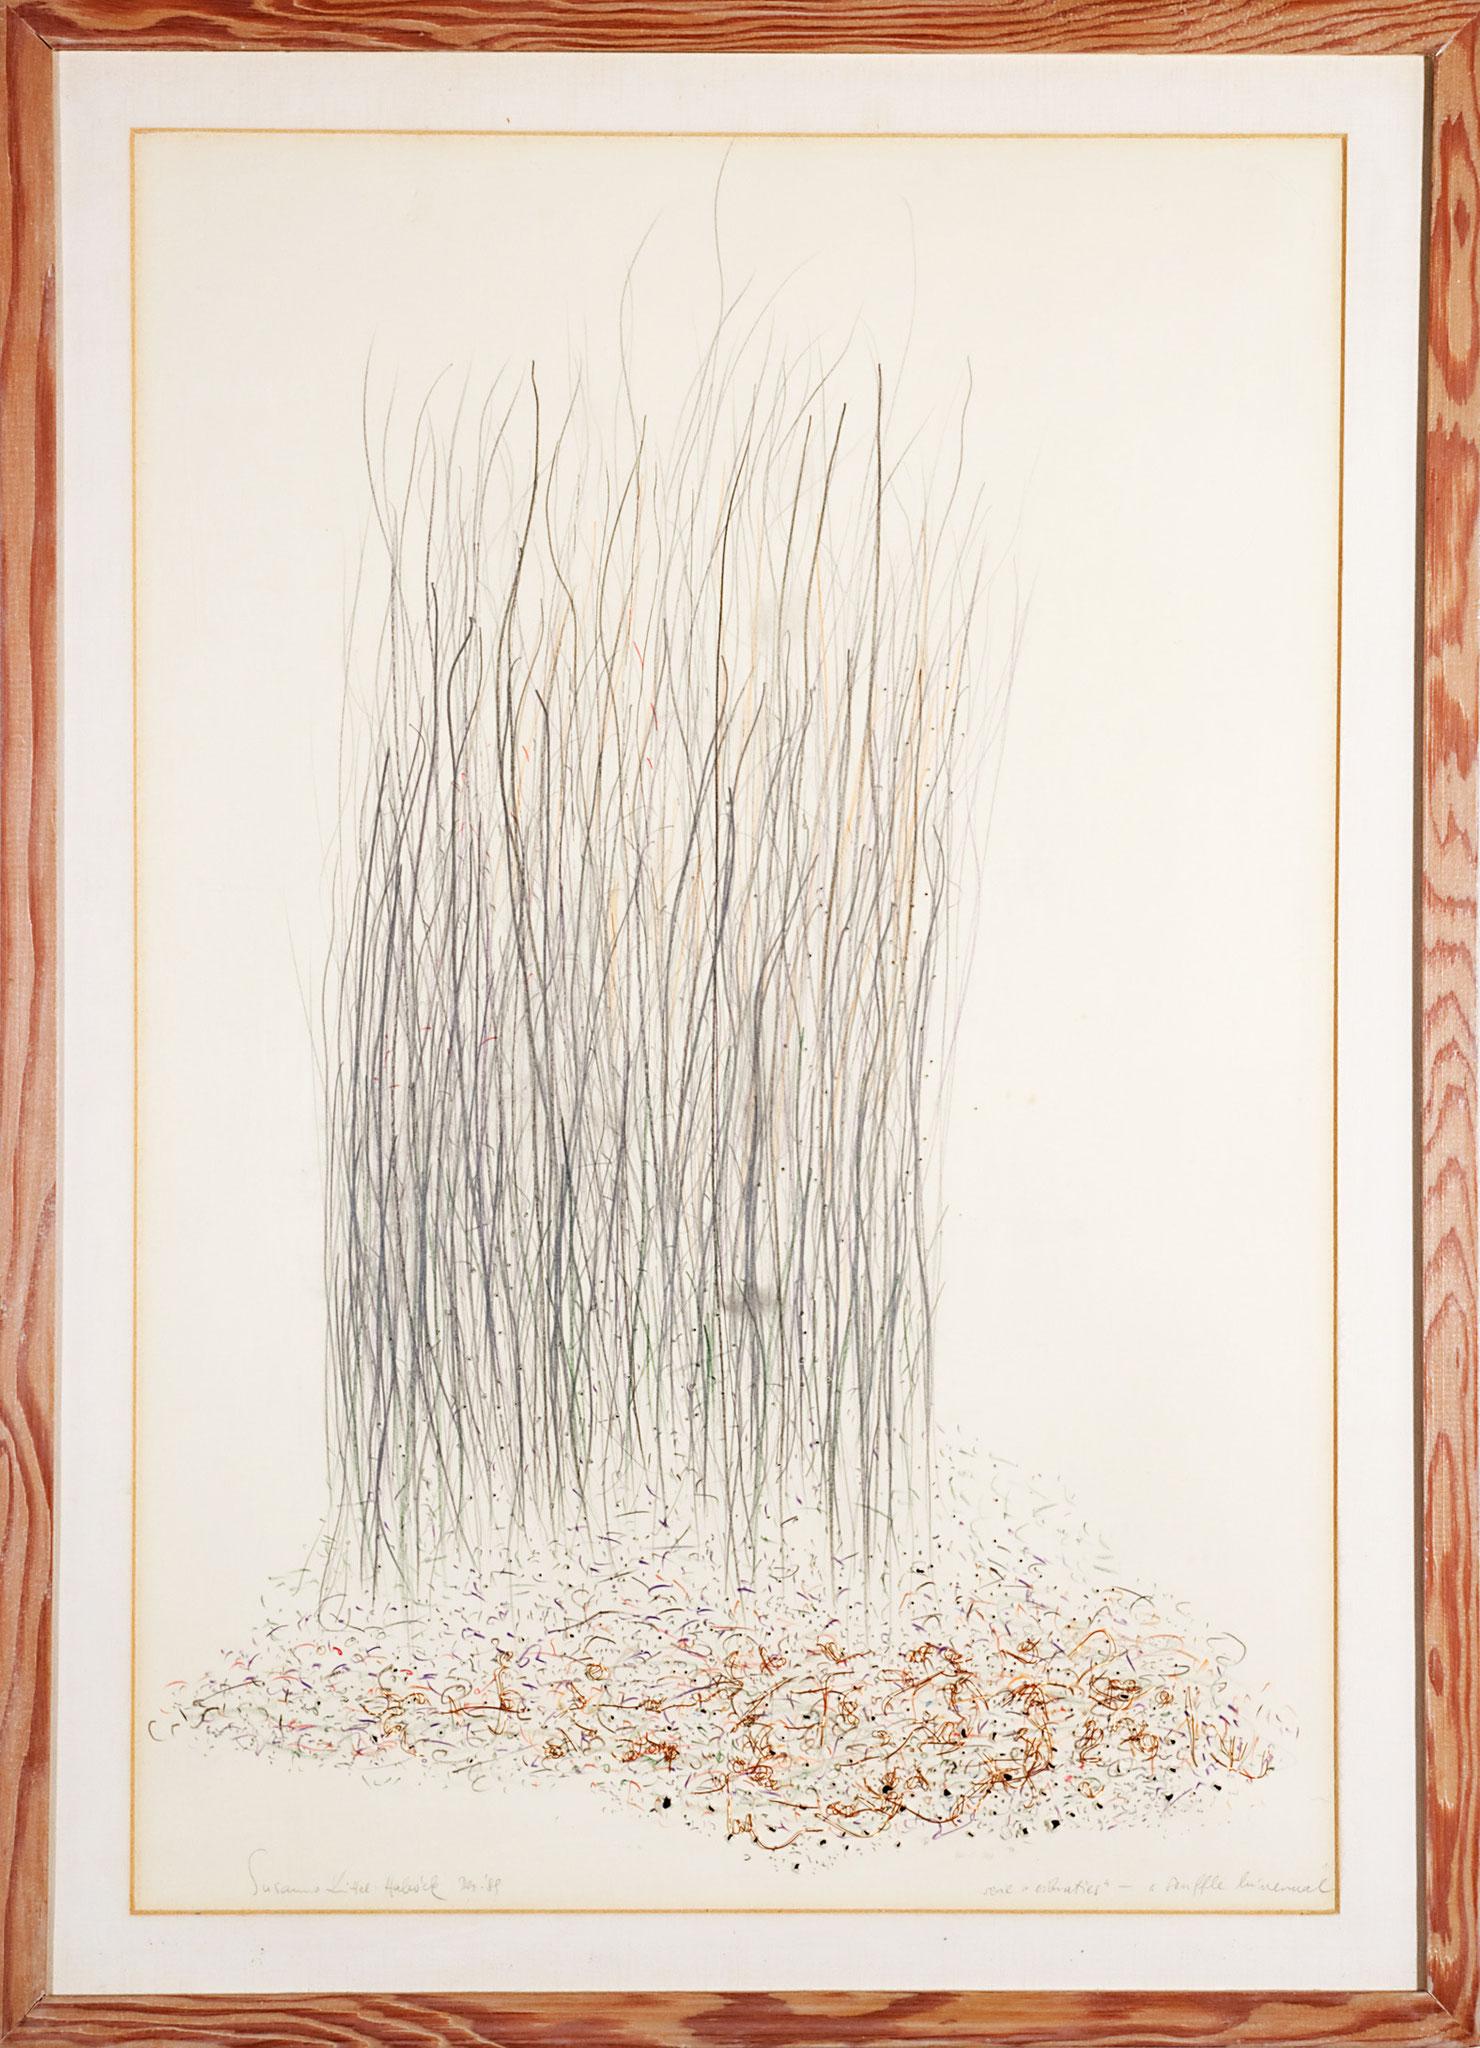 souffle hivernal (Winterwind)   (72x52cm)